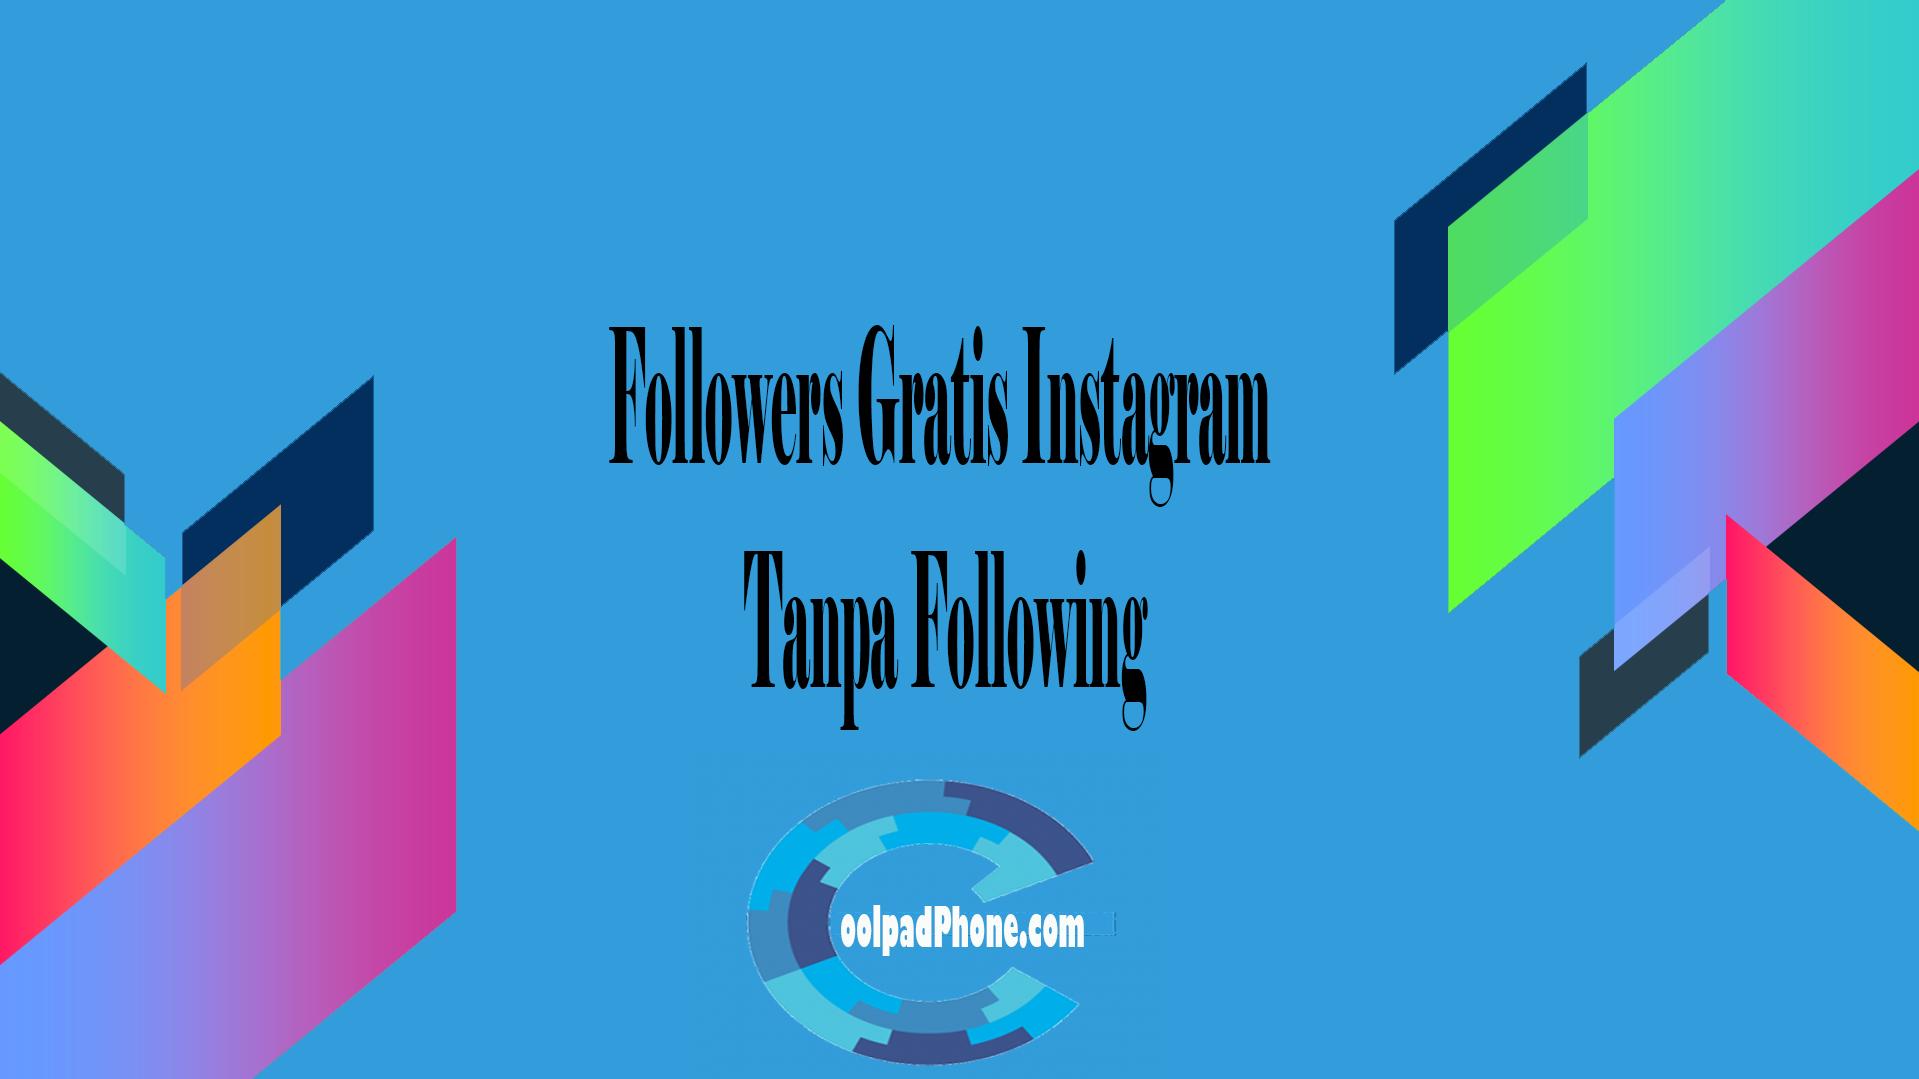 Followers Gratis Instagram Tanpa Following